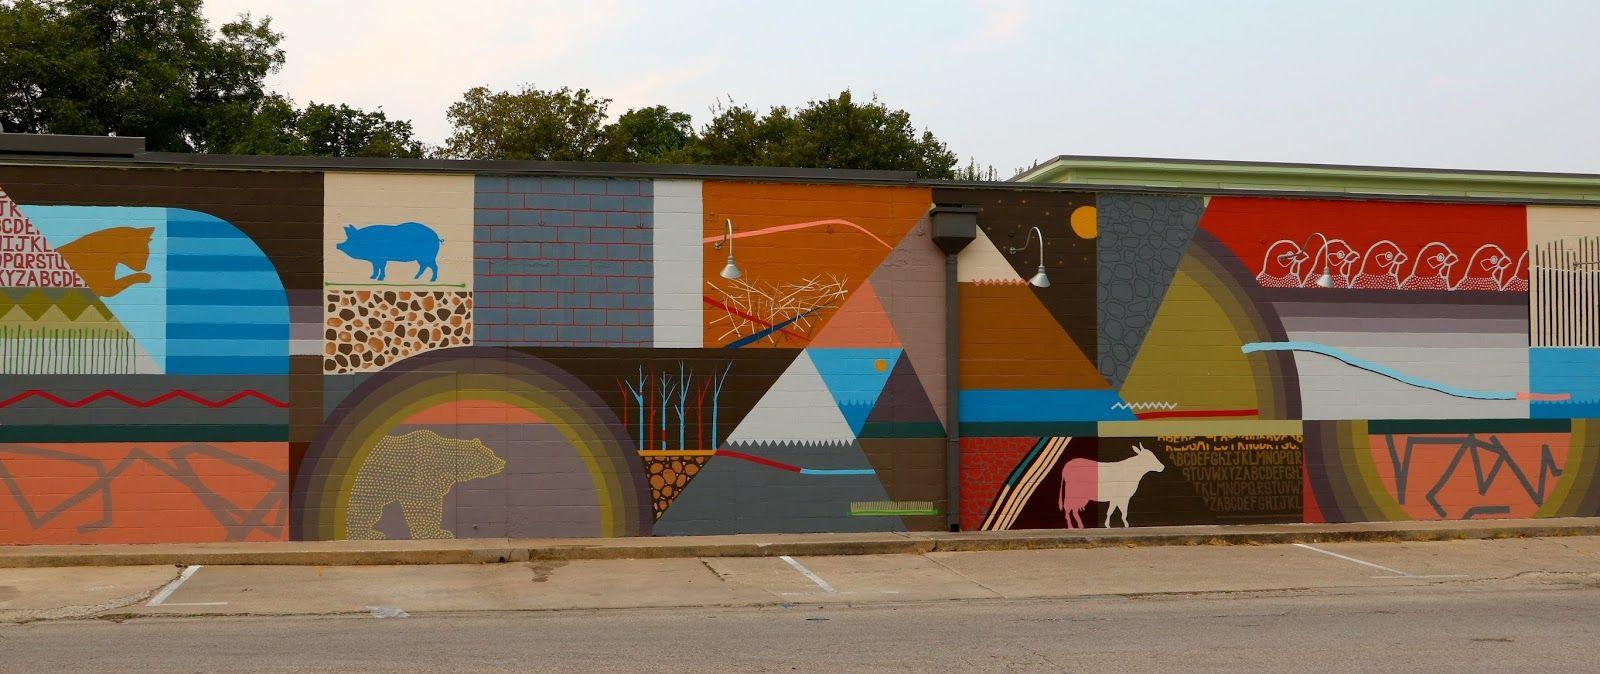 Park Art|My WordPress Blog_Things To Do In Denton Tx At Night